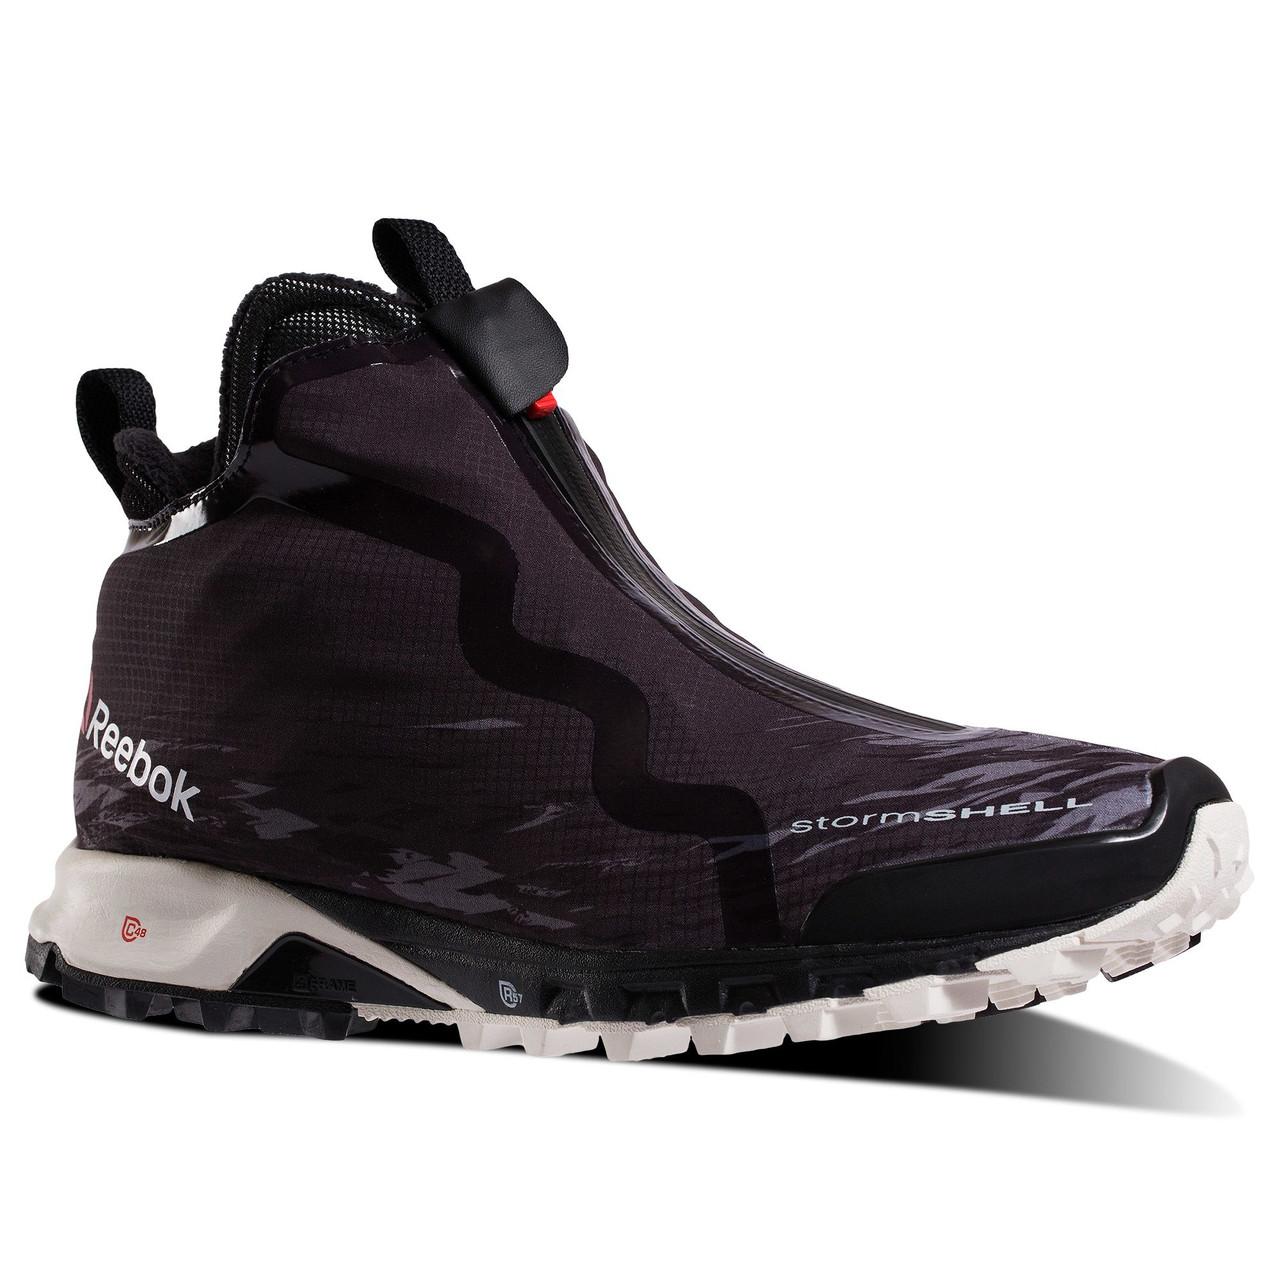 Купить Мужские ботинки Reebok Warm   Tough Chill Mid (Артикул ... b72c67e8f98